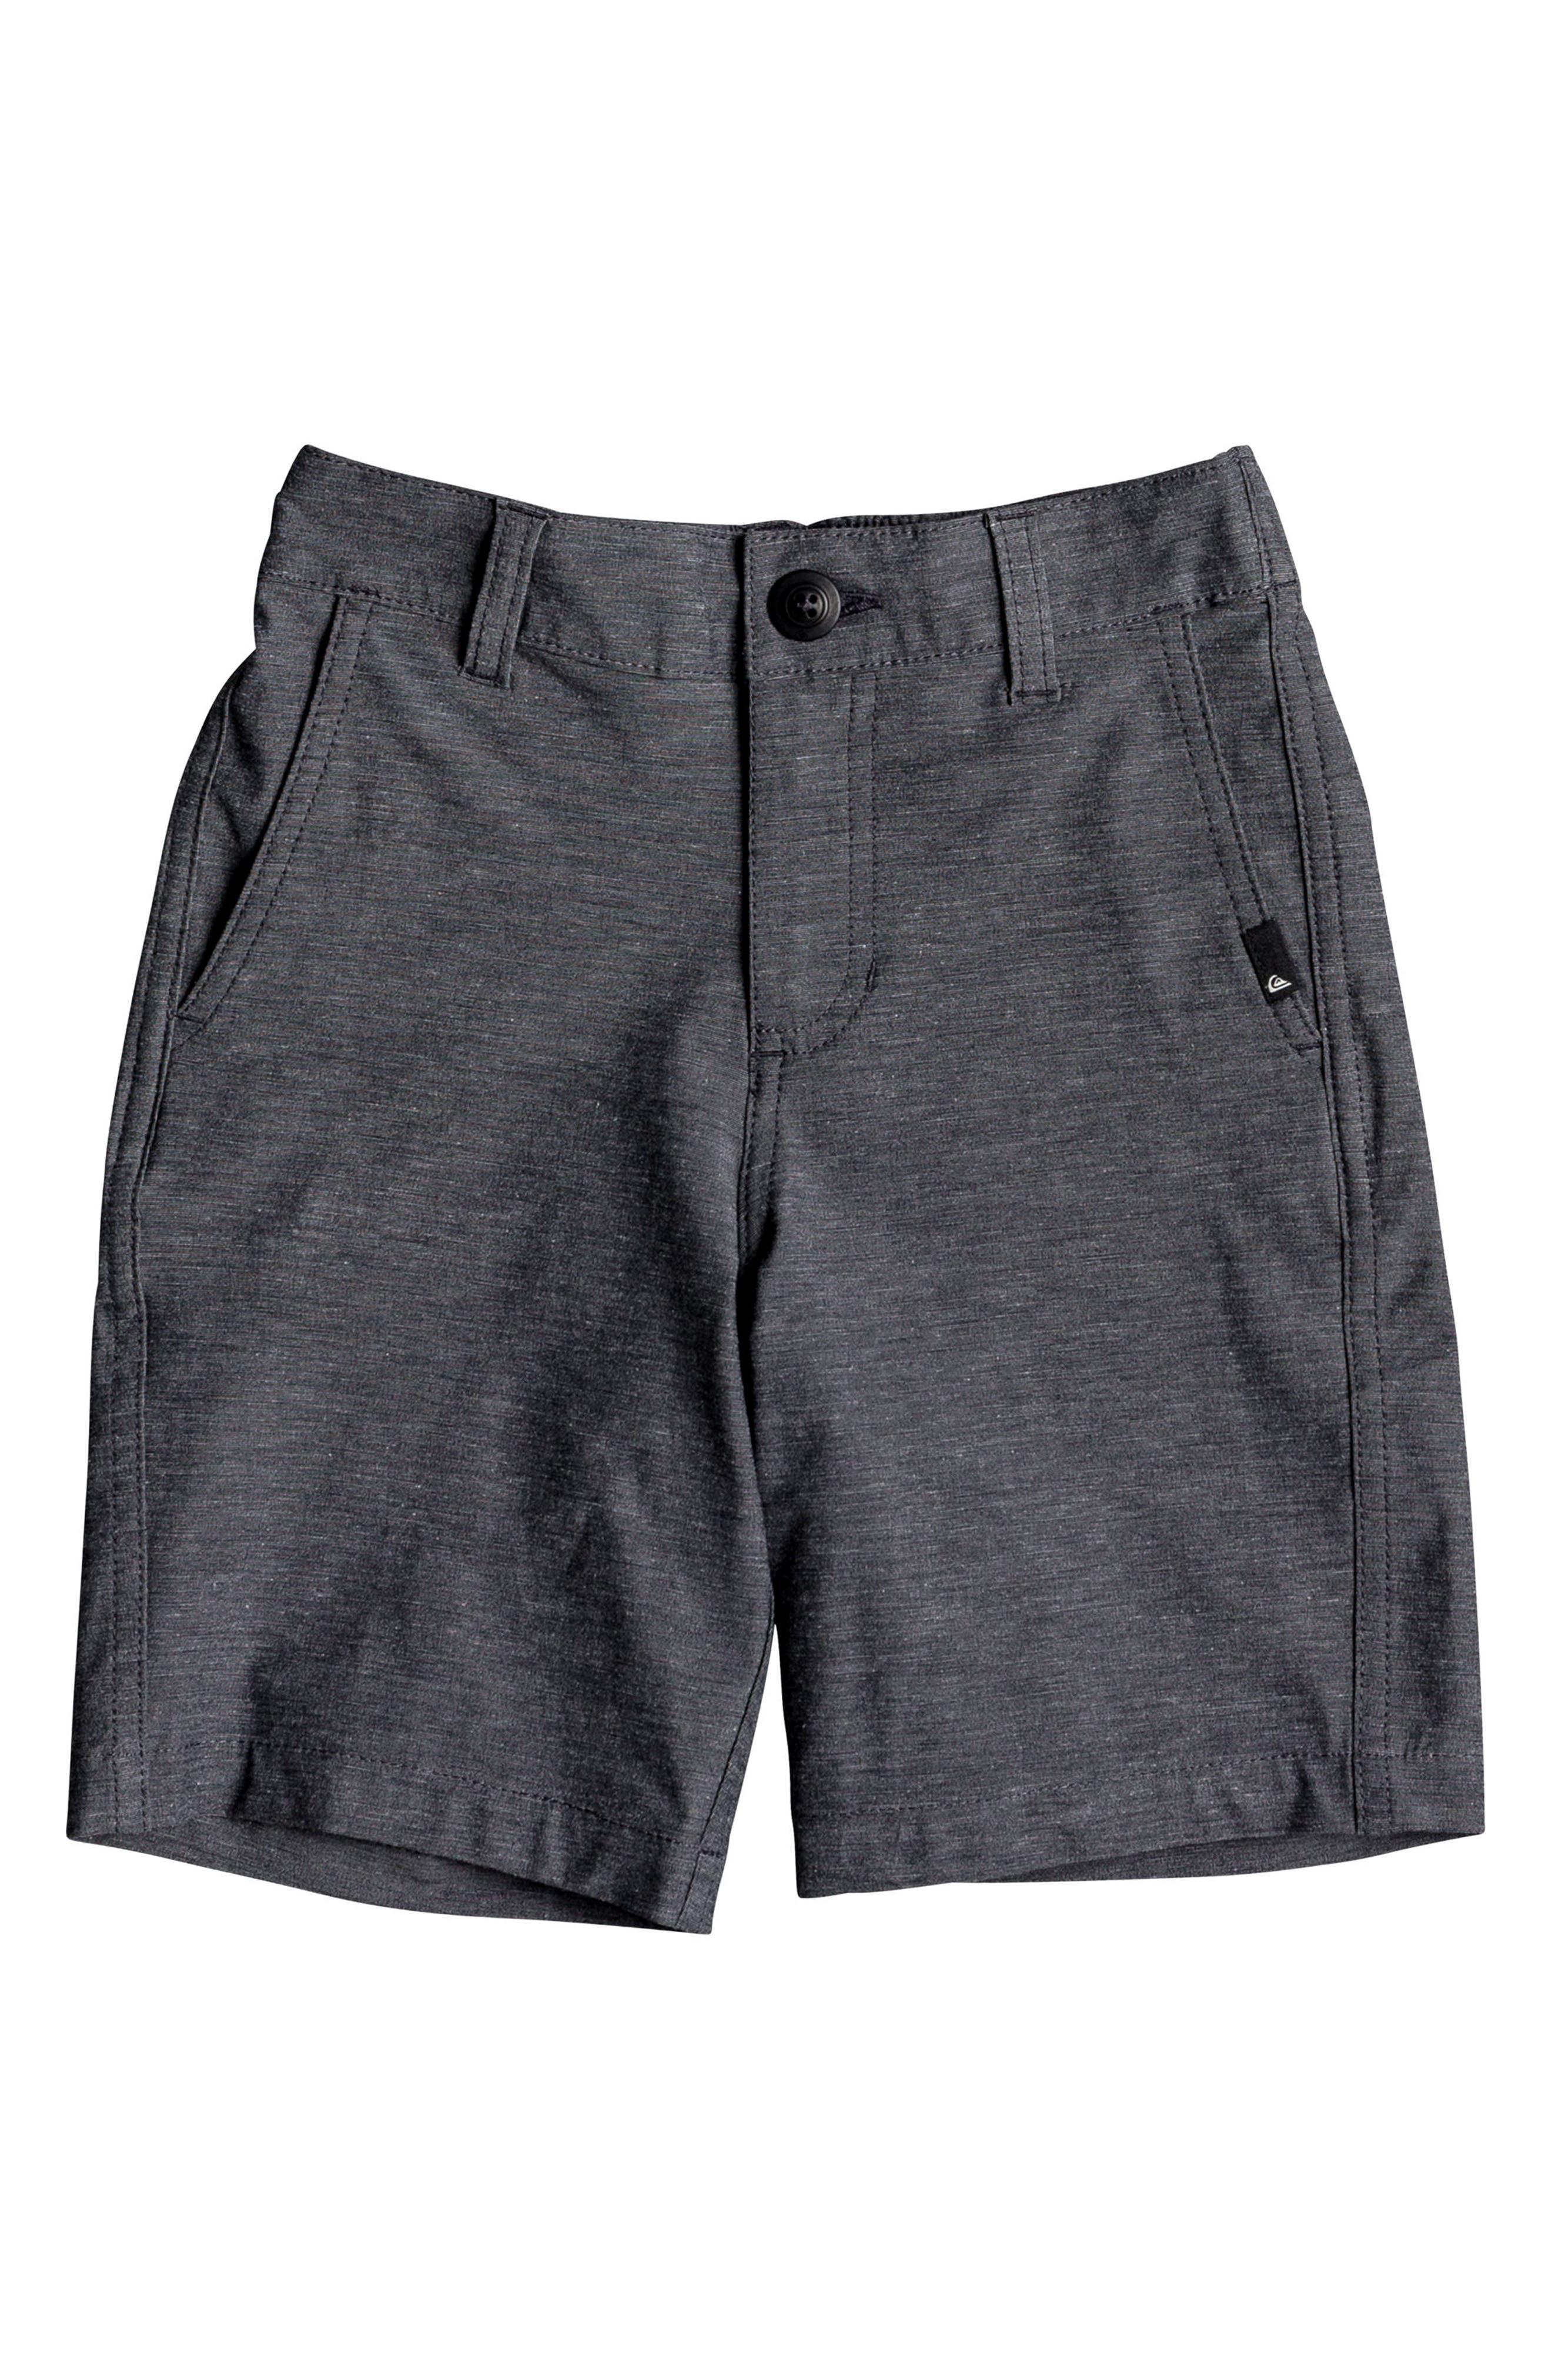 Union Heather Amphibian Board Shorts,                         Main,                         color, Black